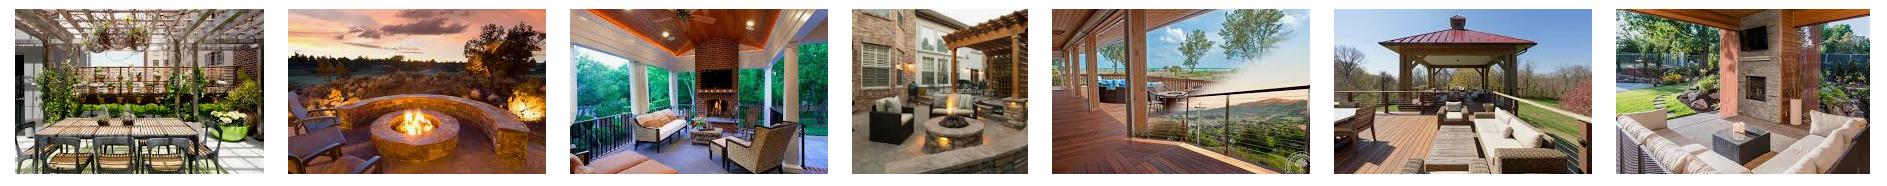 Outdoor-Renovation-Houston